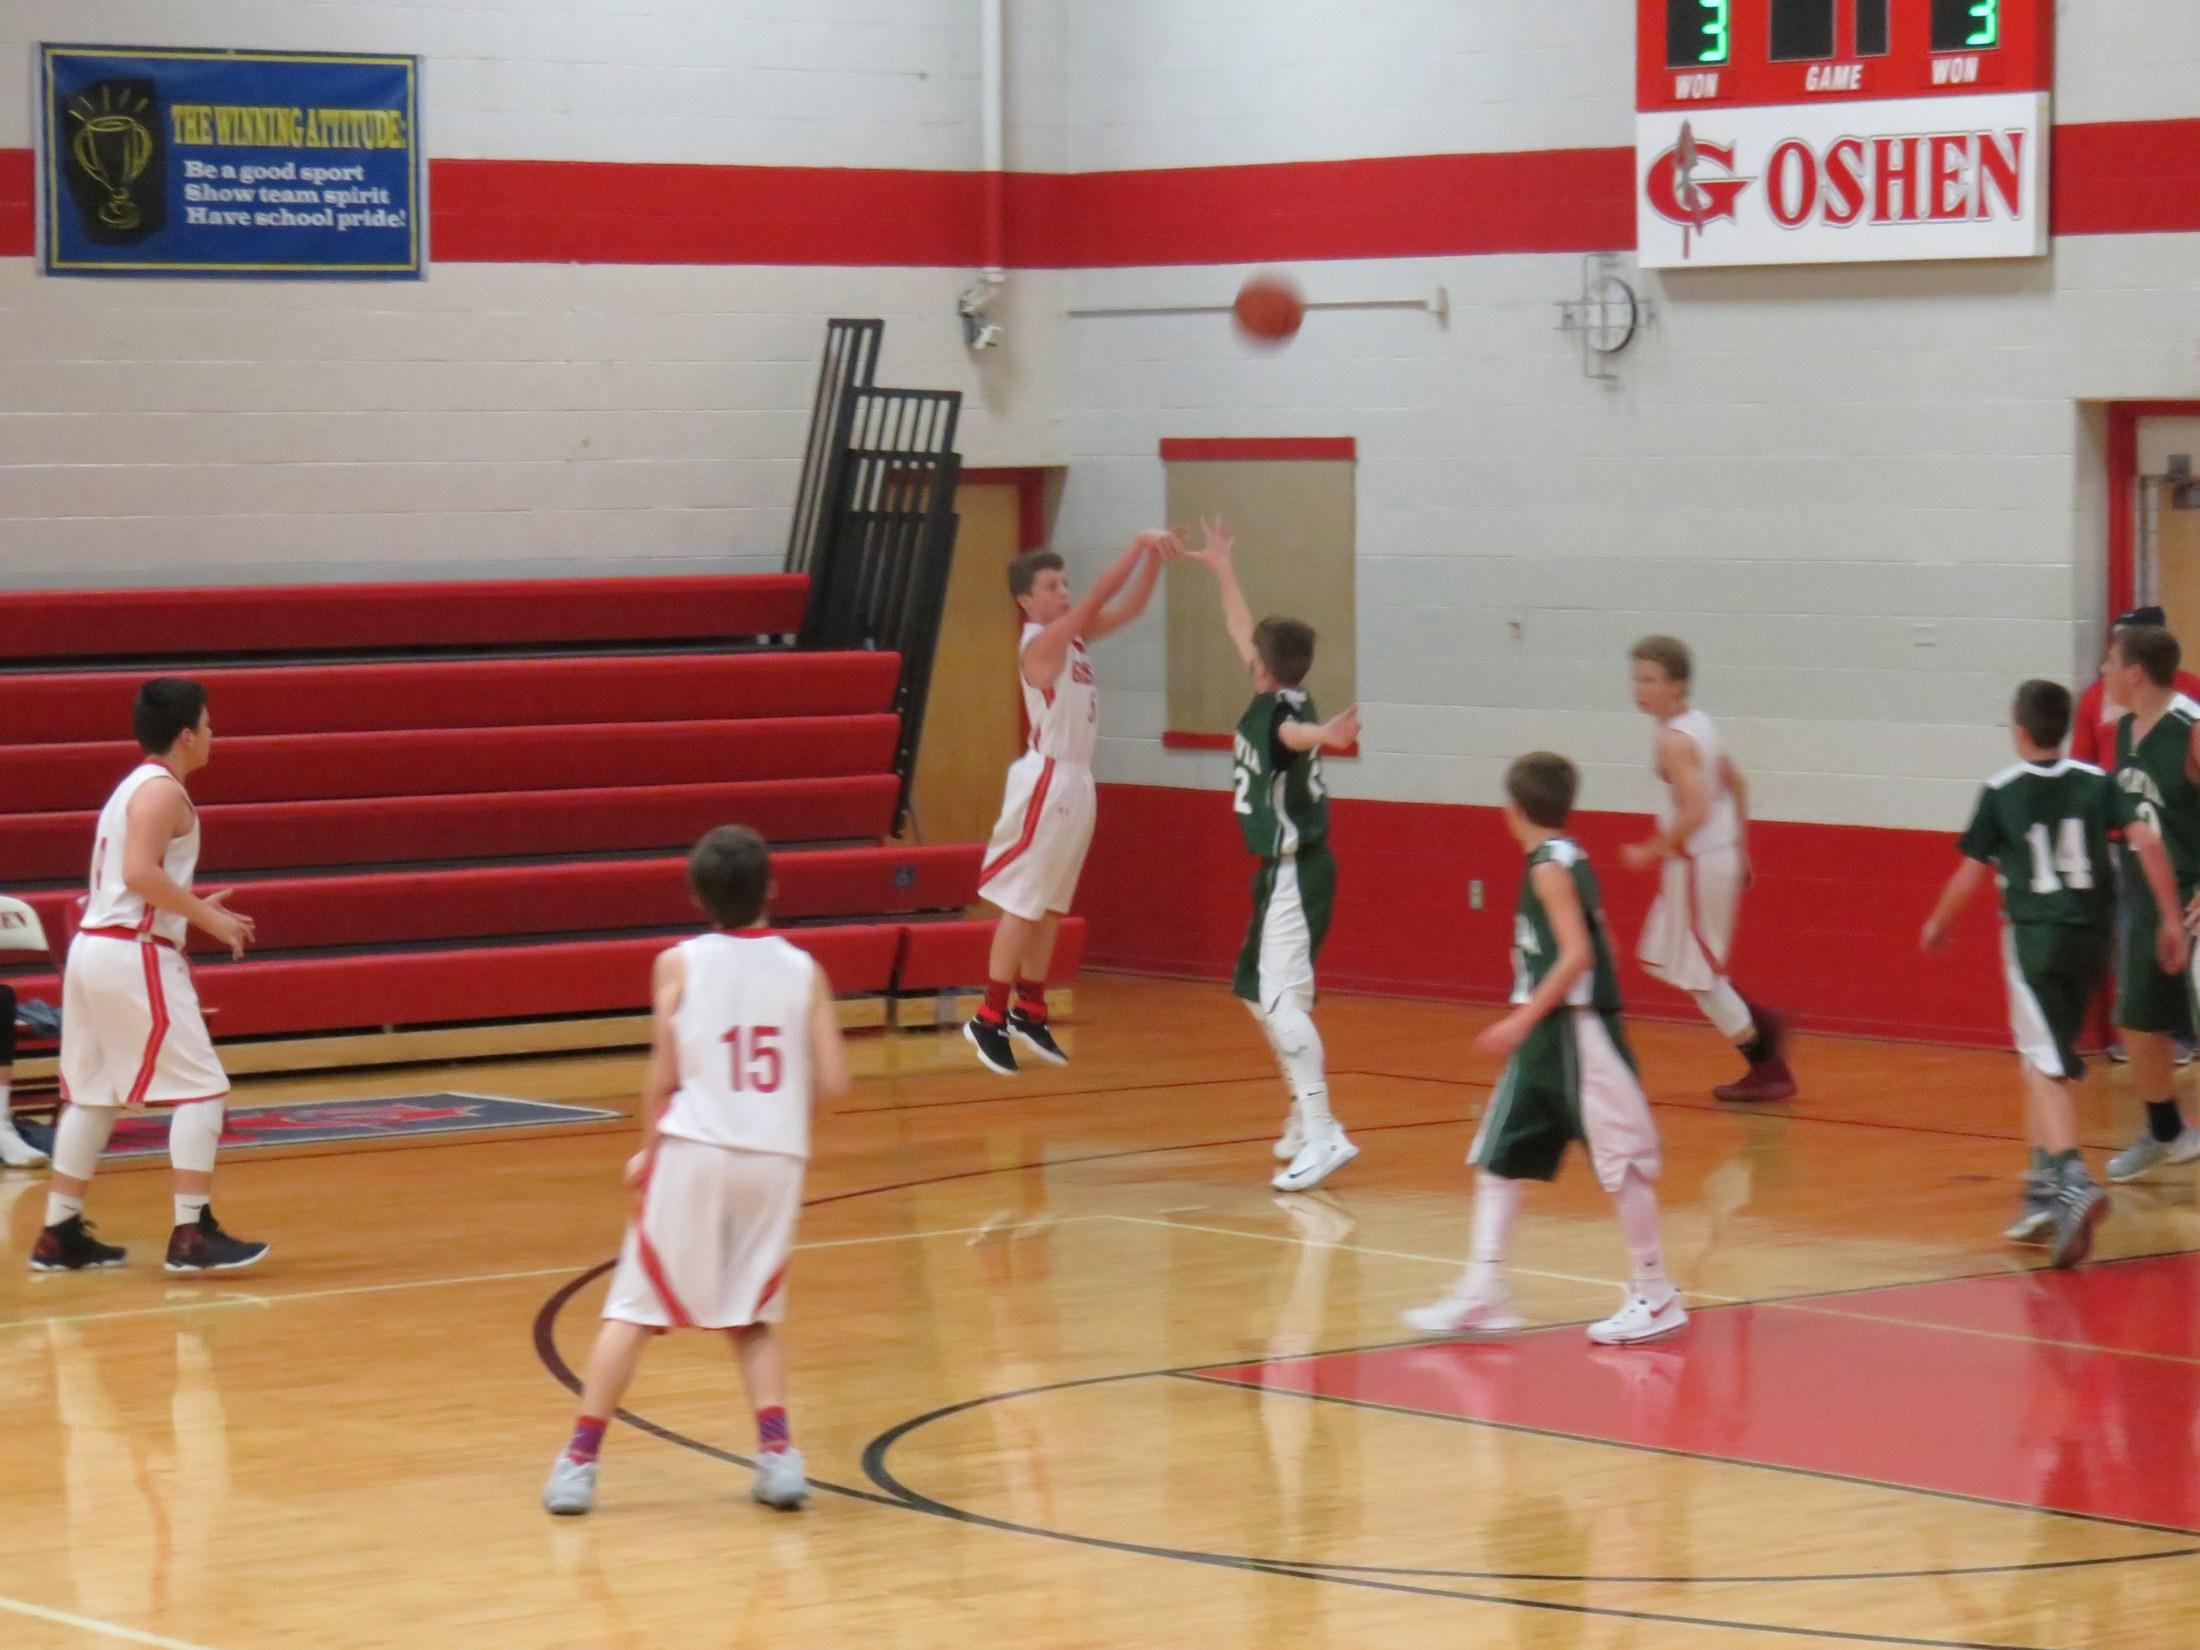 8th grade boys basketball player Jack Webster